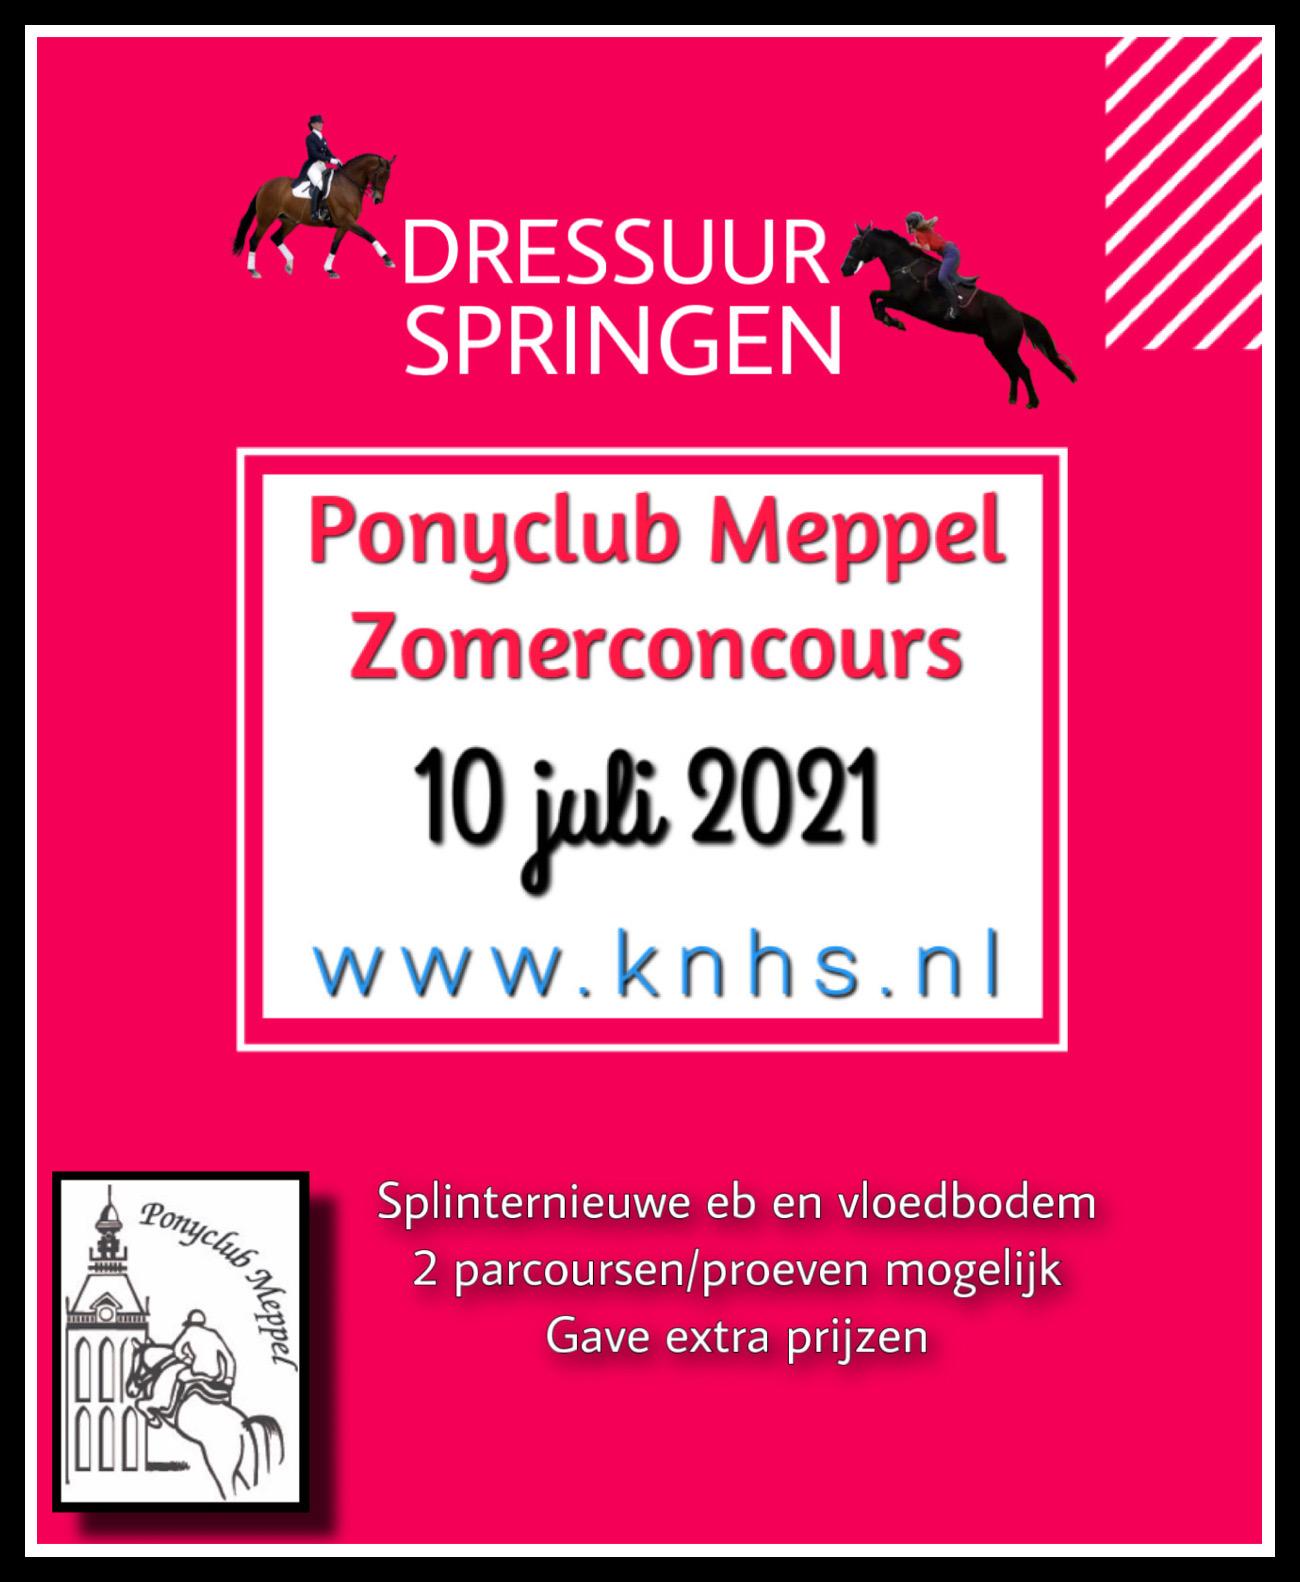 Zomerconcours-CT-02-Ponyclub-Meppel